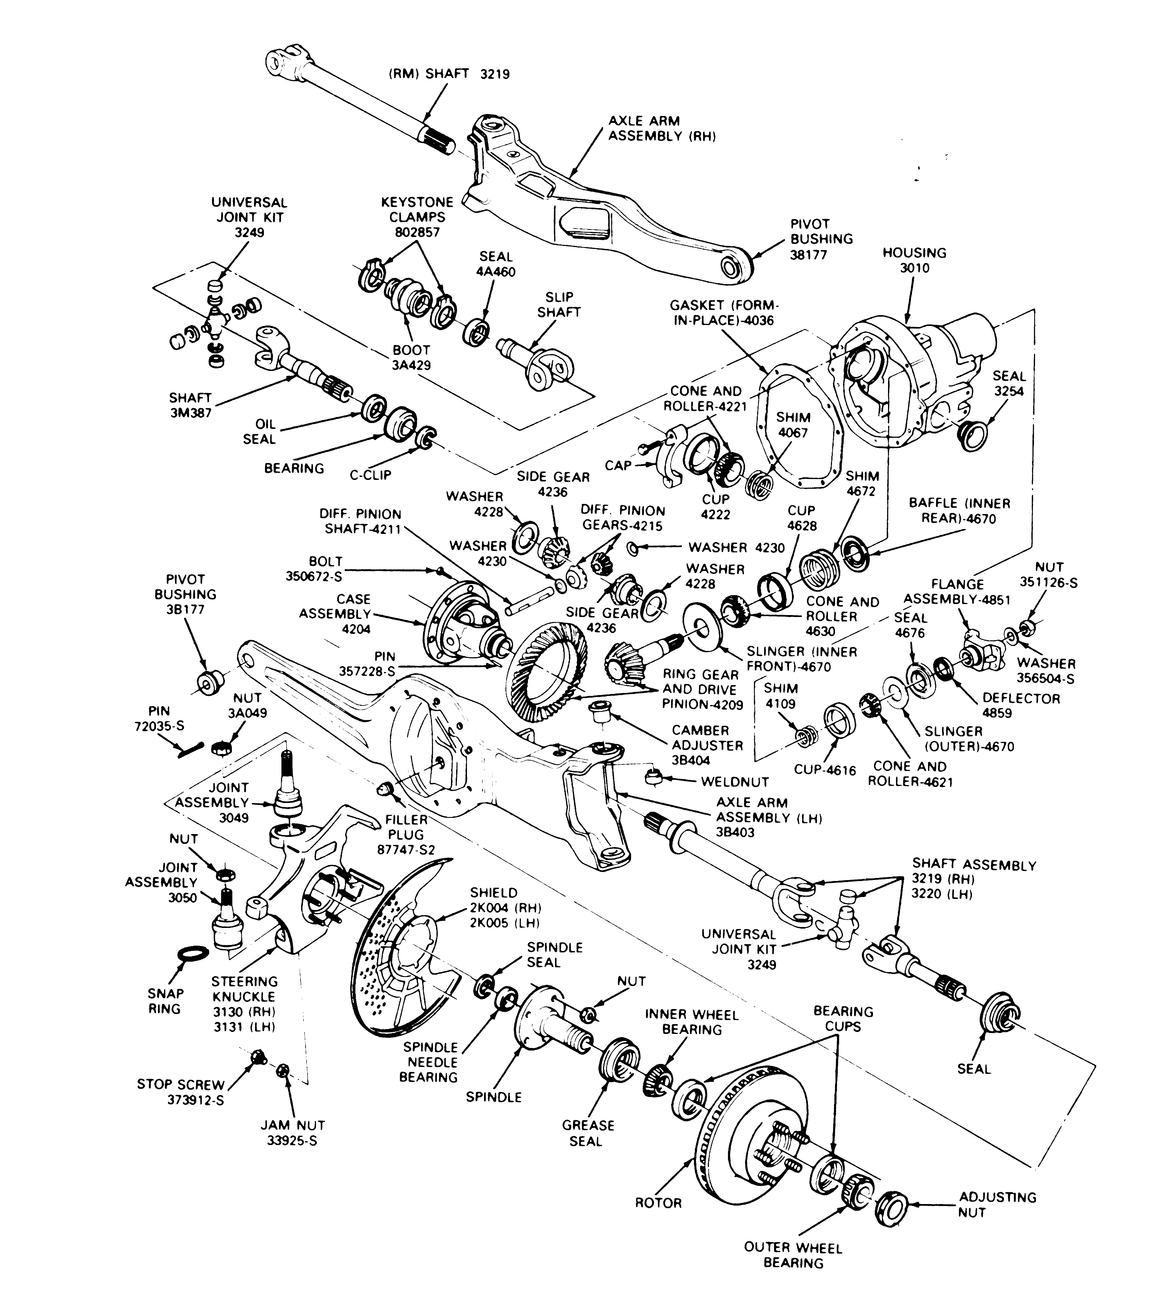 the ford dana 44 ttb axle